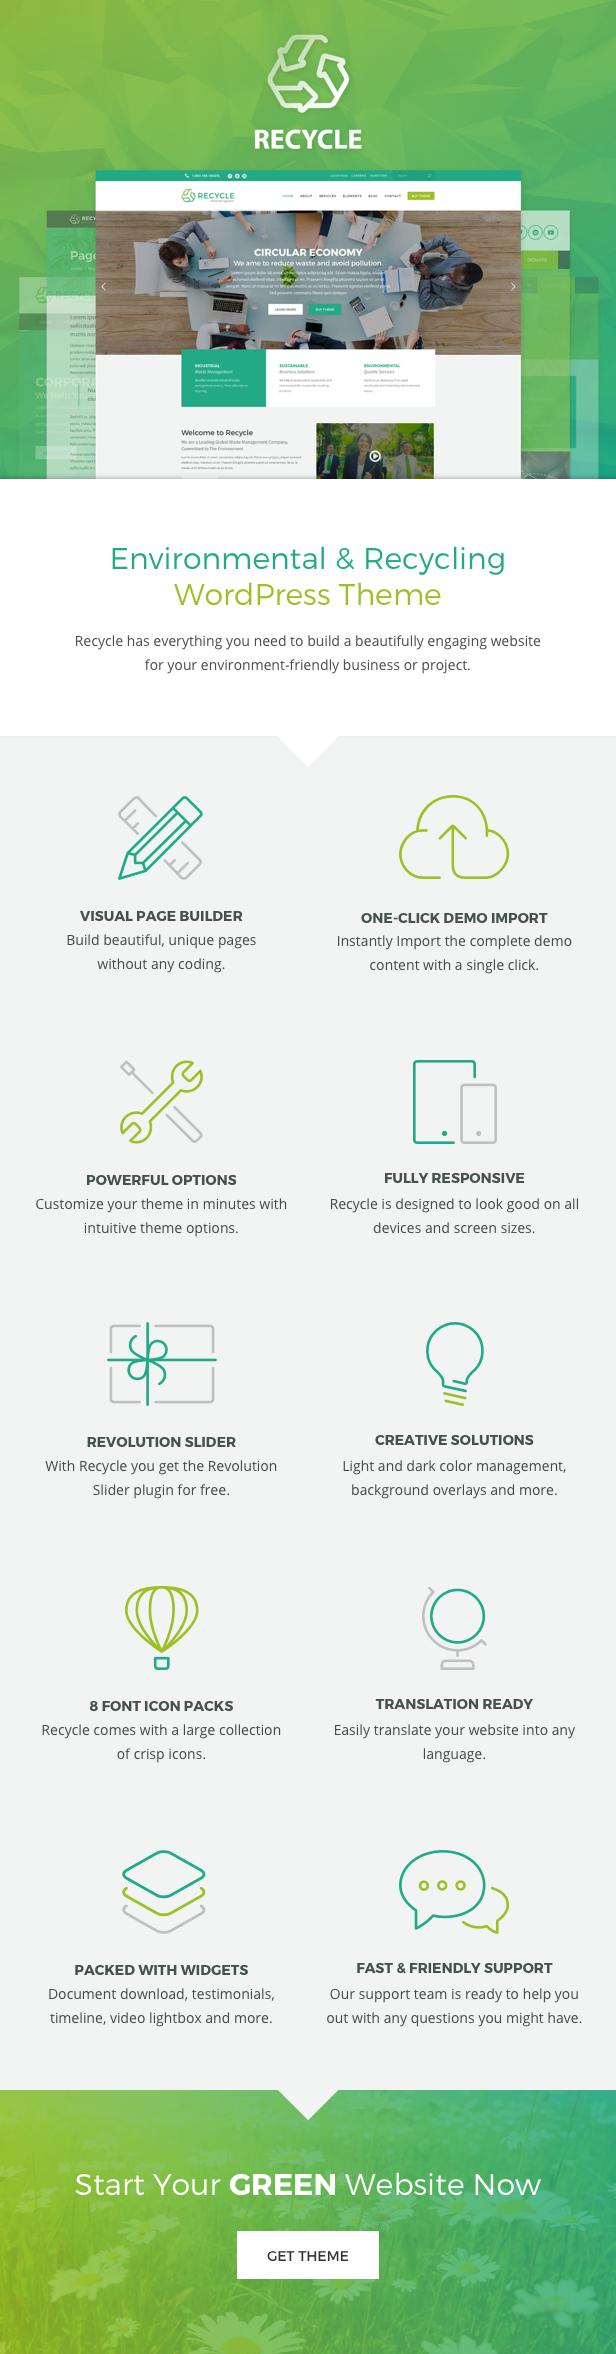 Recycle - Umwelt & Green Business WordPress Theme - 1